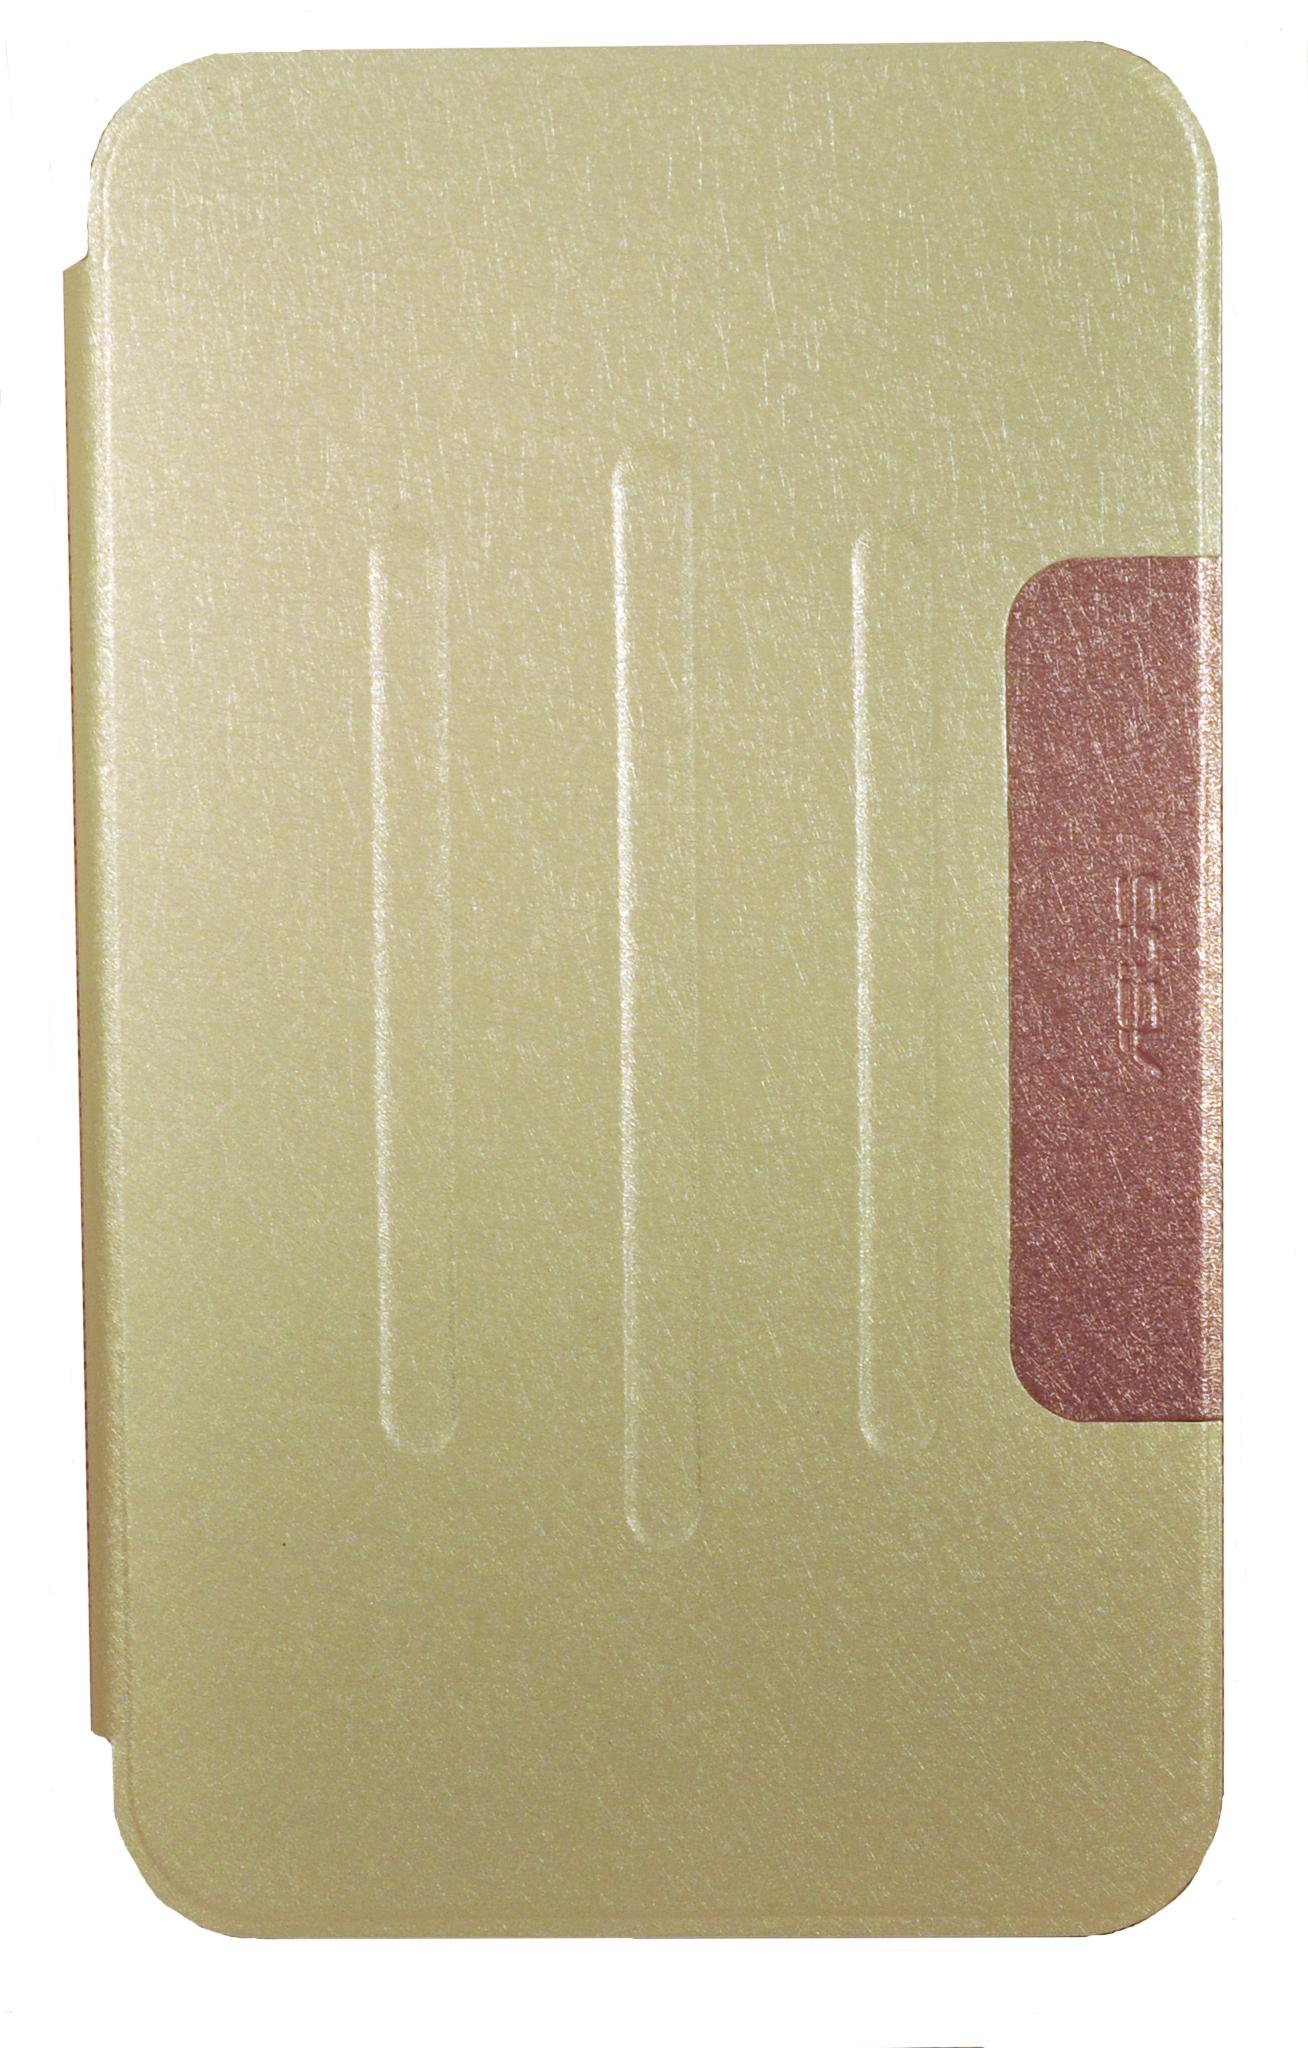 noname Book Cover ��� ASUS MeMO Pad 8 ME581CL � ����������� ���������� ��� �������� (����������)